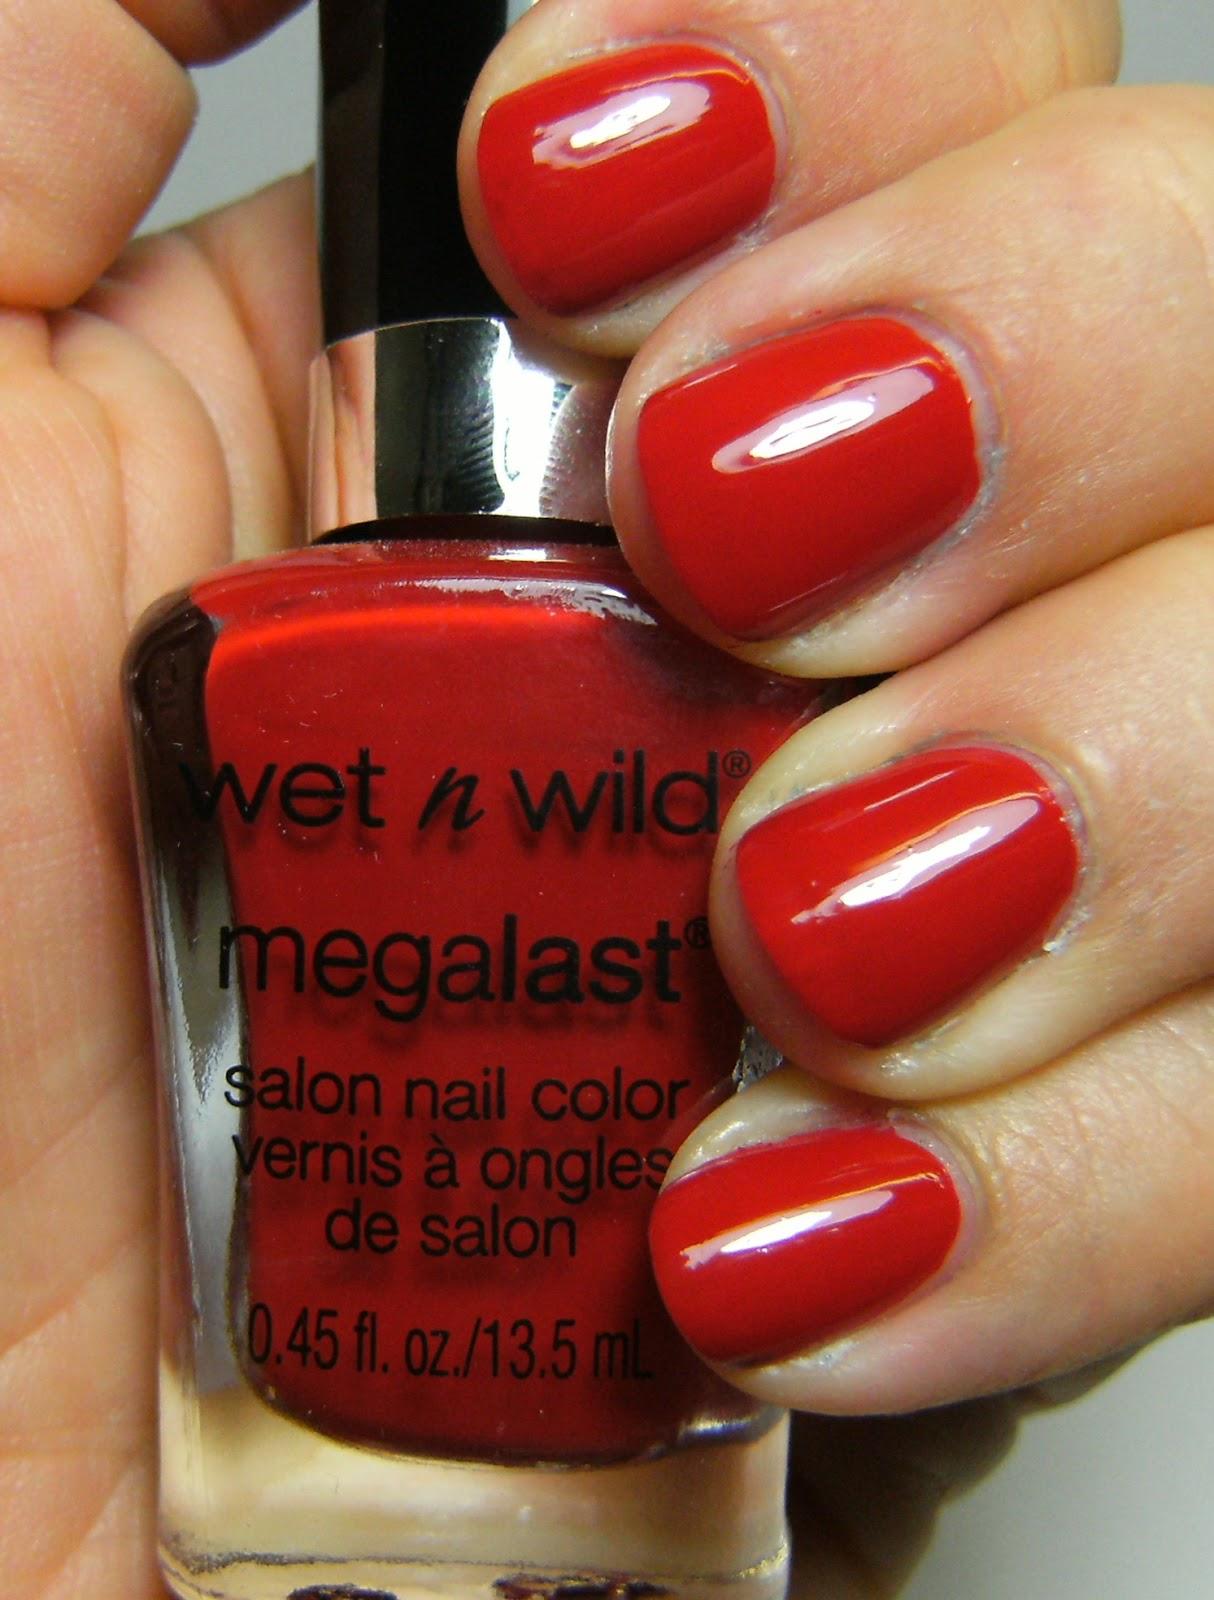 Deez Nailz Wet N Wild Mega Last In Canada Megalast Salon Nail Color Candylicious